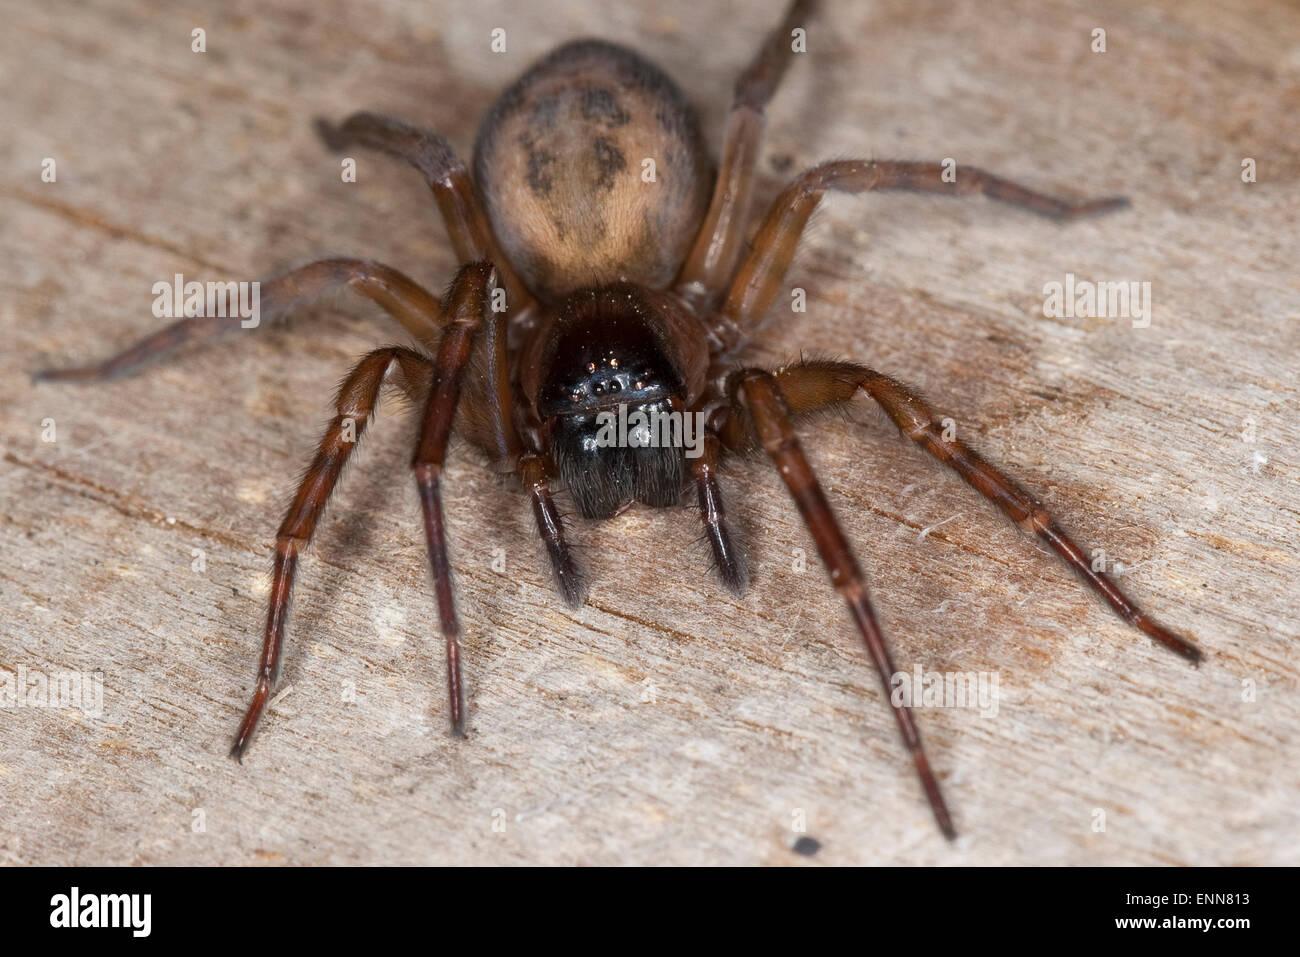 Lace weaver spider, House spider, female, Fensterspinne, Finsterspinne, Kellerspinne, Weibchen, Amaurobius similis - Stock Image